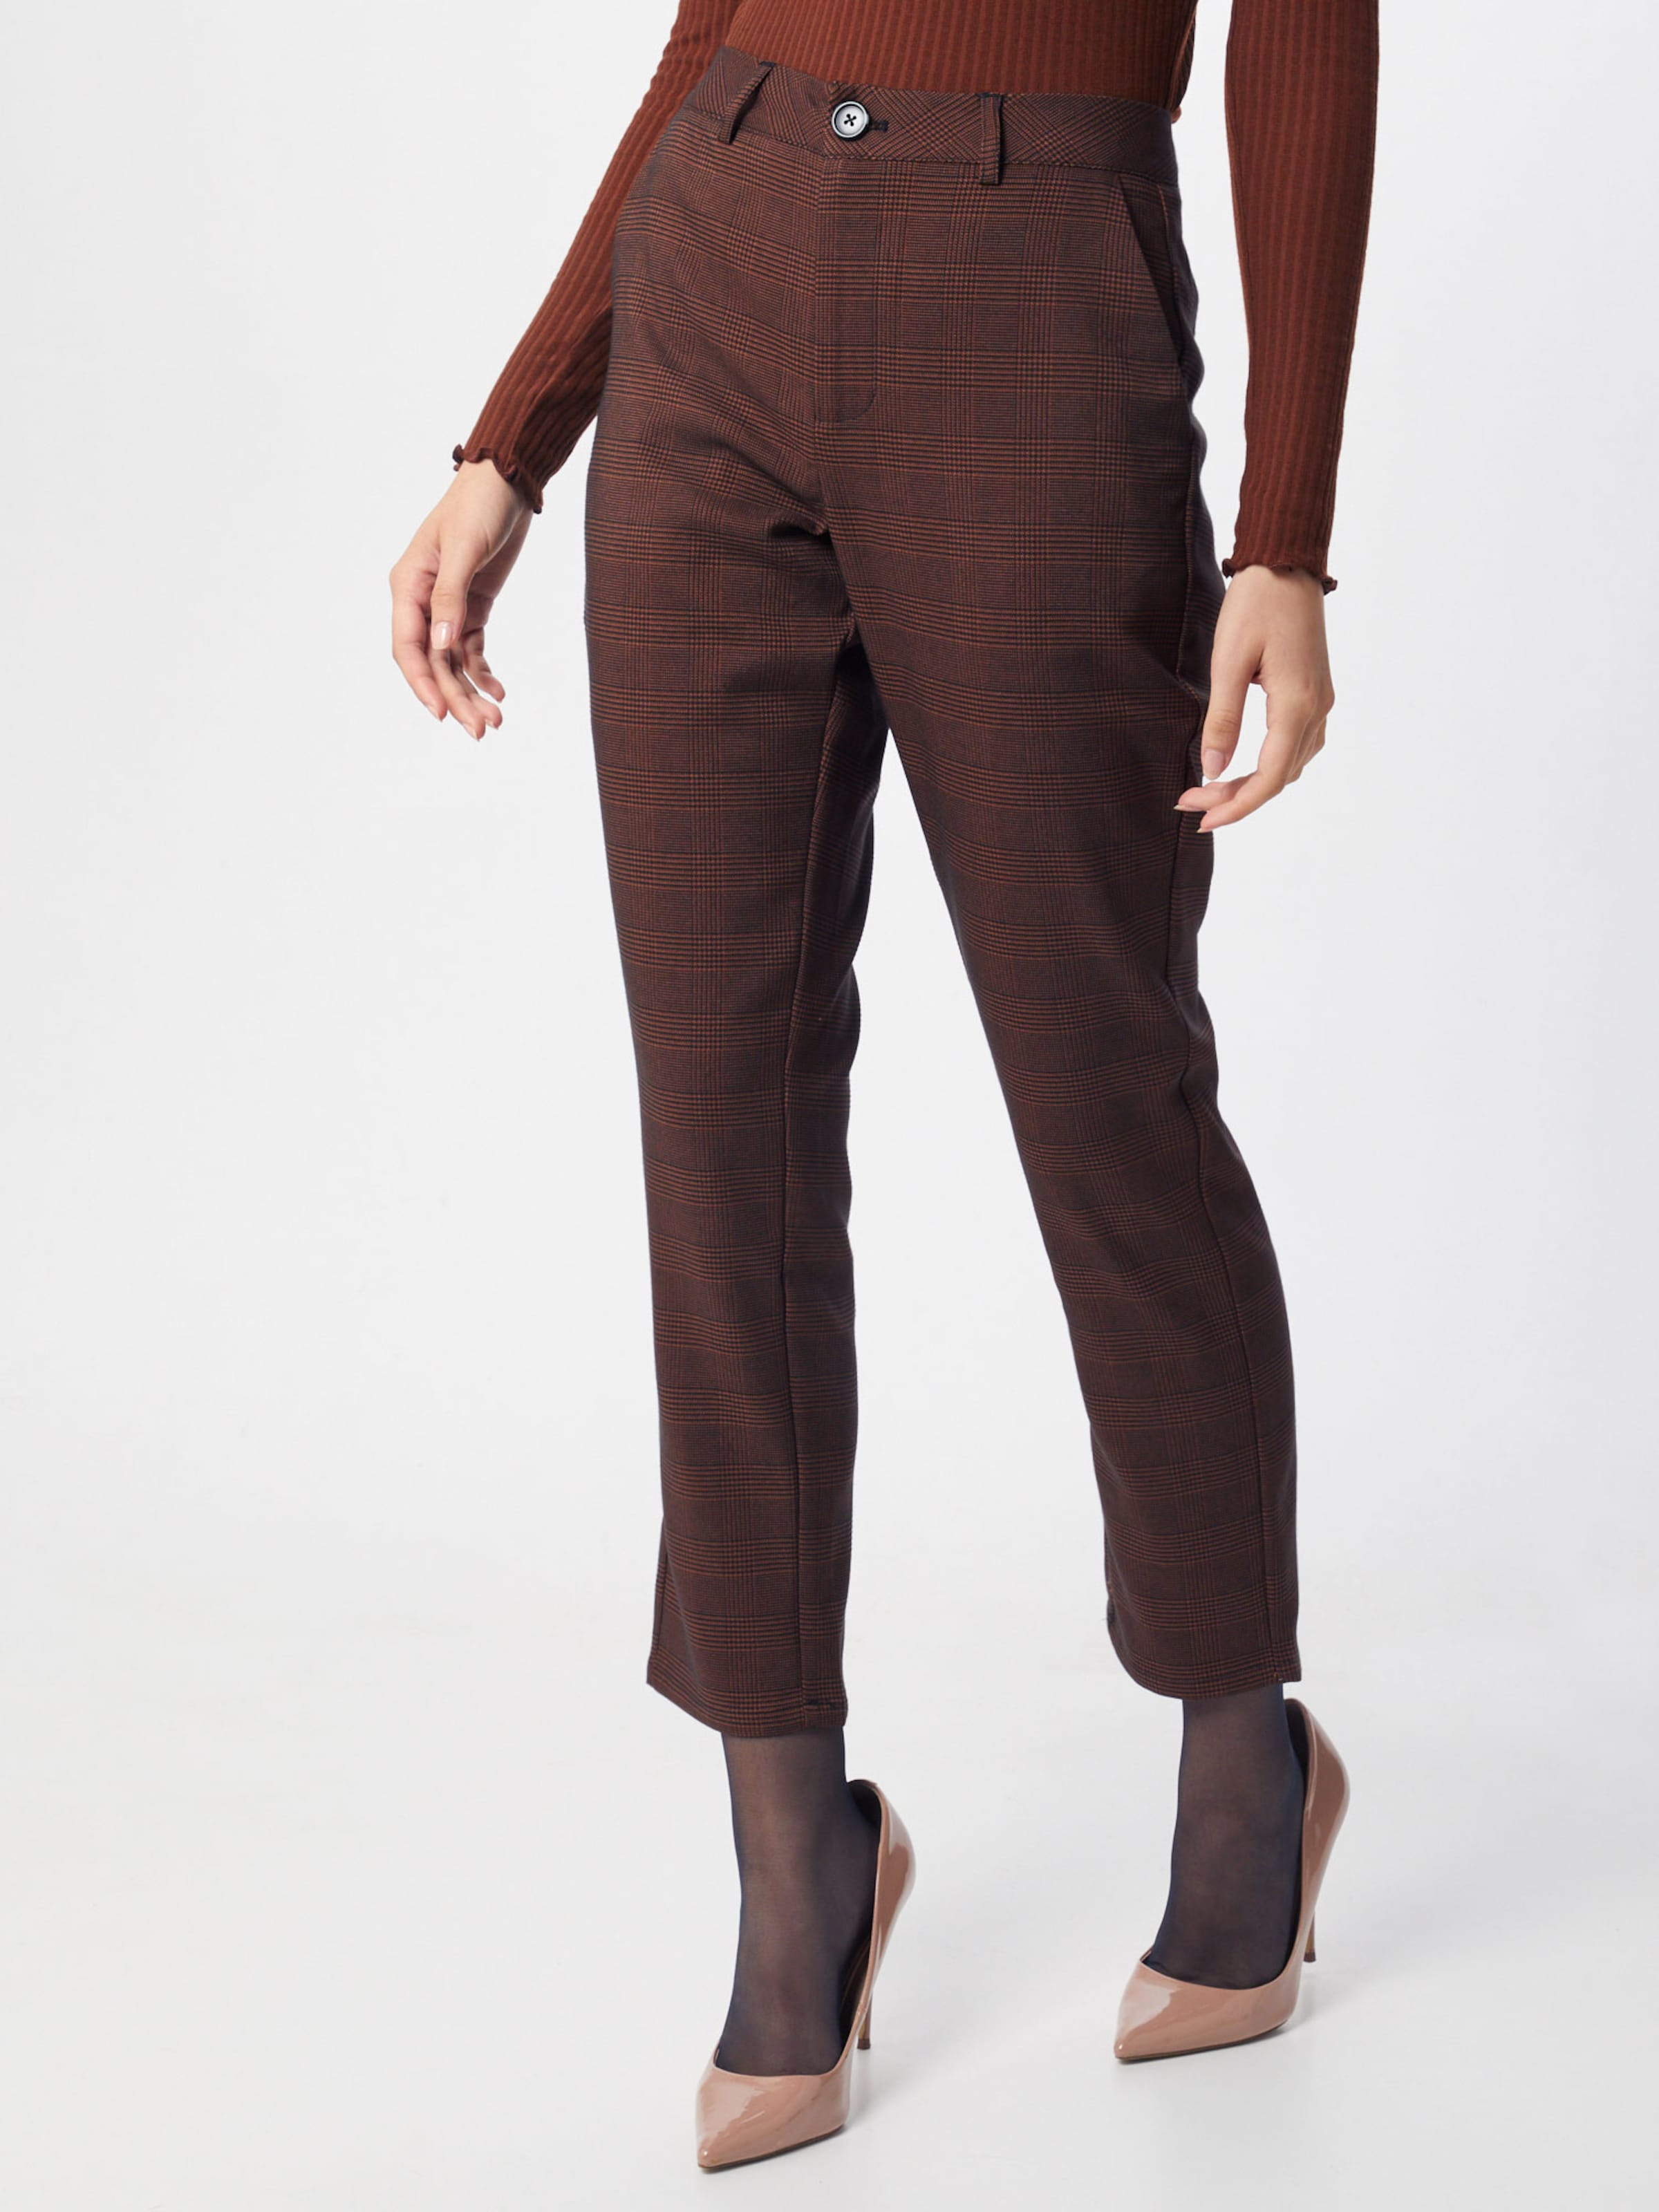 Kirschrot 'katasja In Pants' Hose Kaffe bEDWHYe2I9